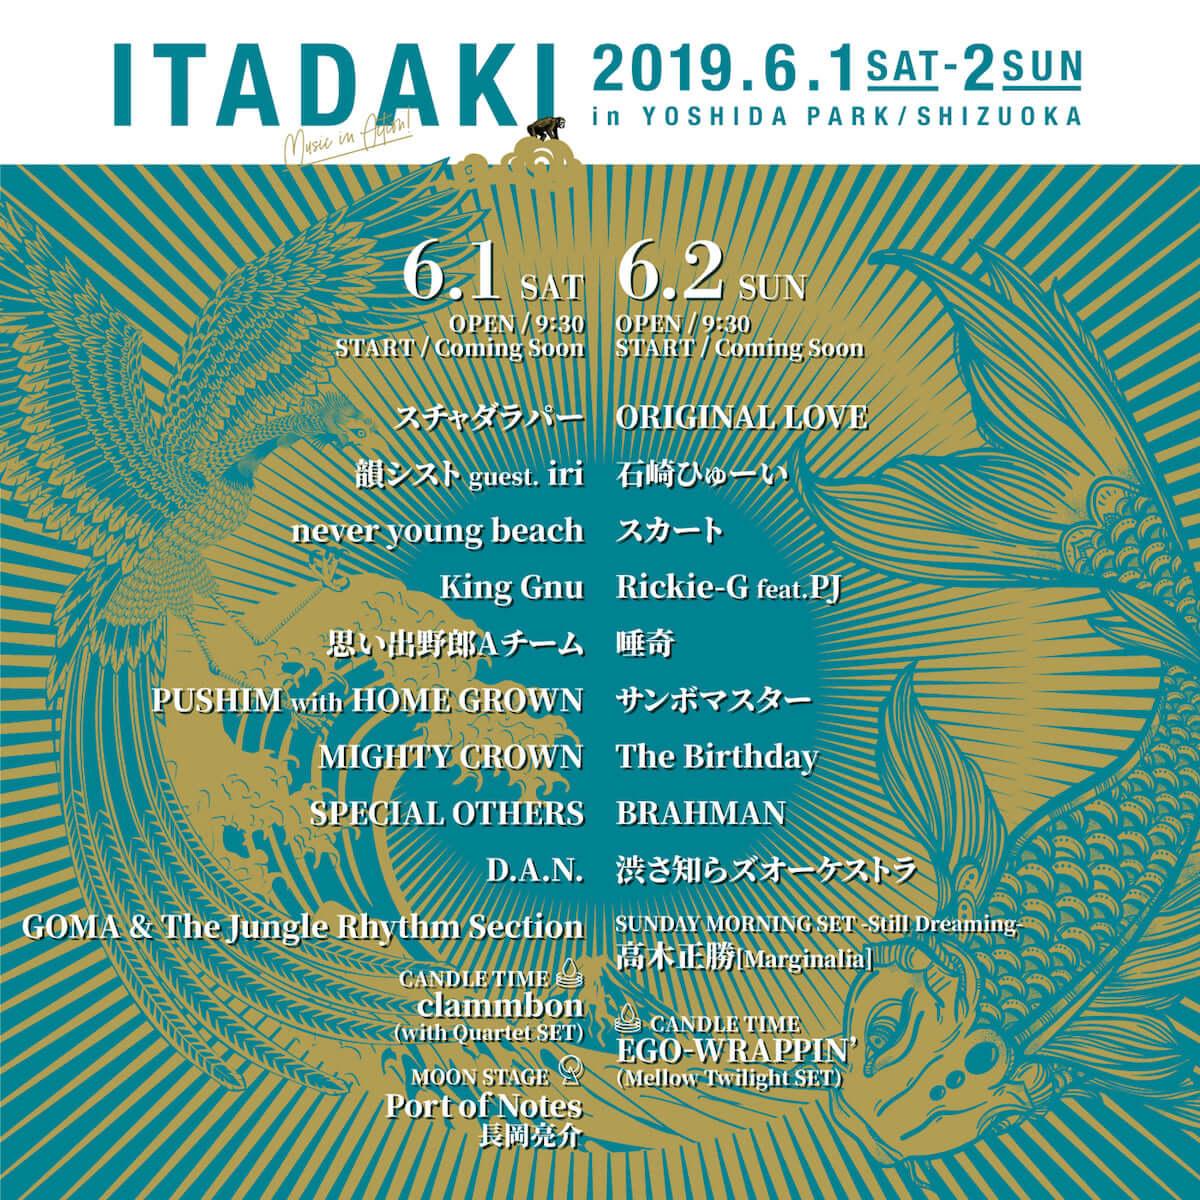 D.A.N.や唾奇、ネバヤンら出演「頂 -ITADAKI- 2019」の日割りが発表に。チケットは3月30日朝10時から発売! music190329-itadaki2019-1200x1200